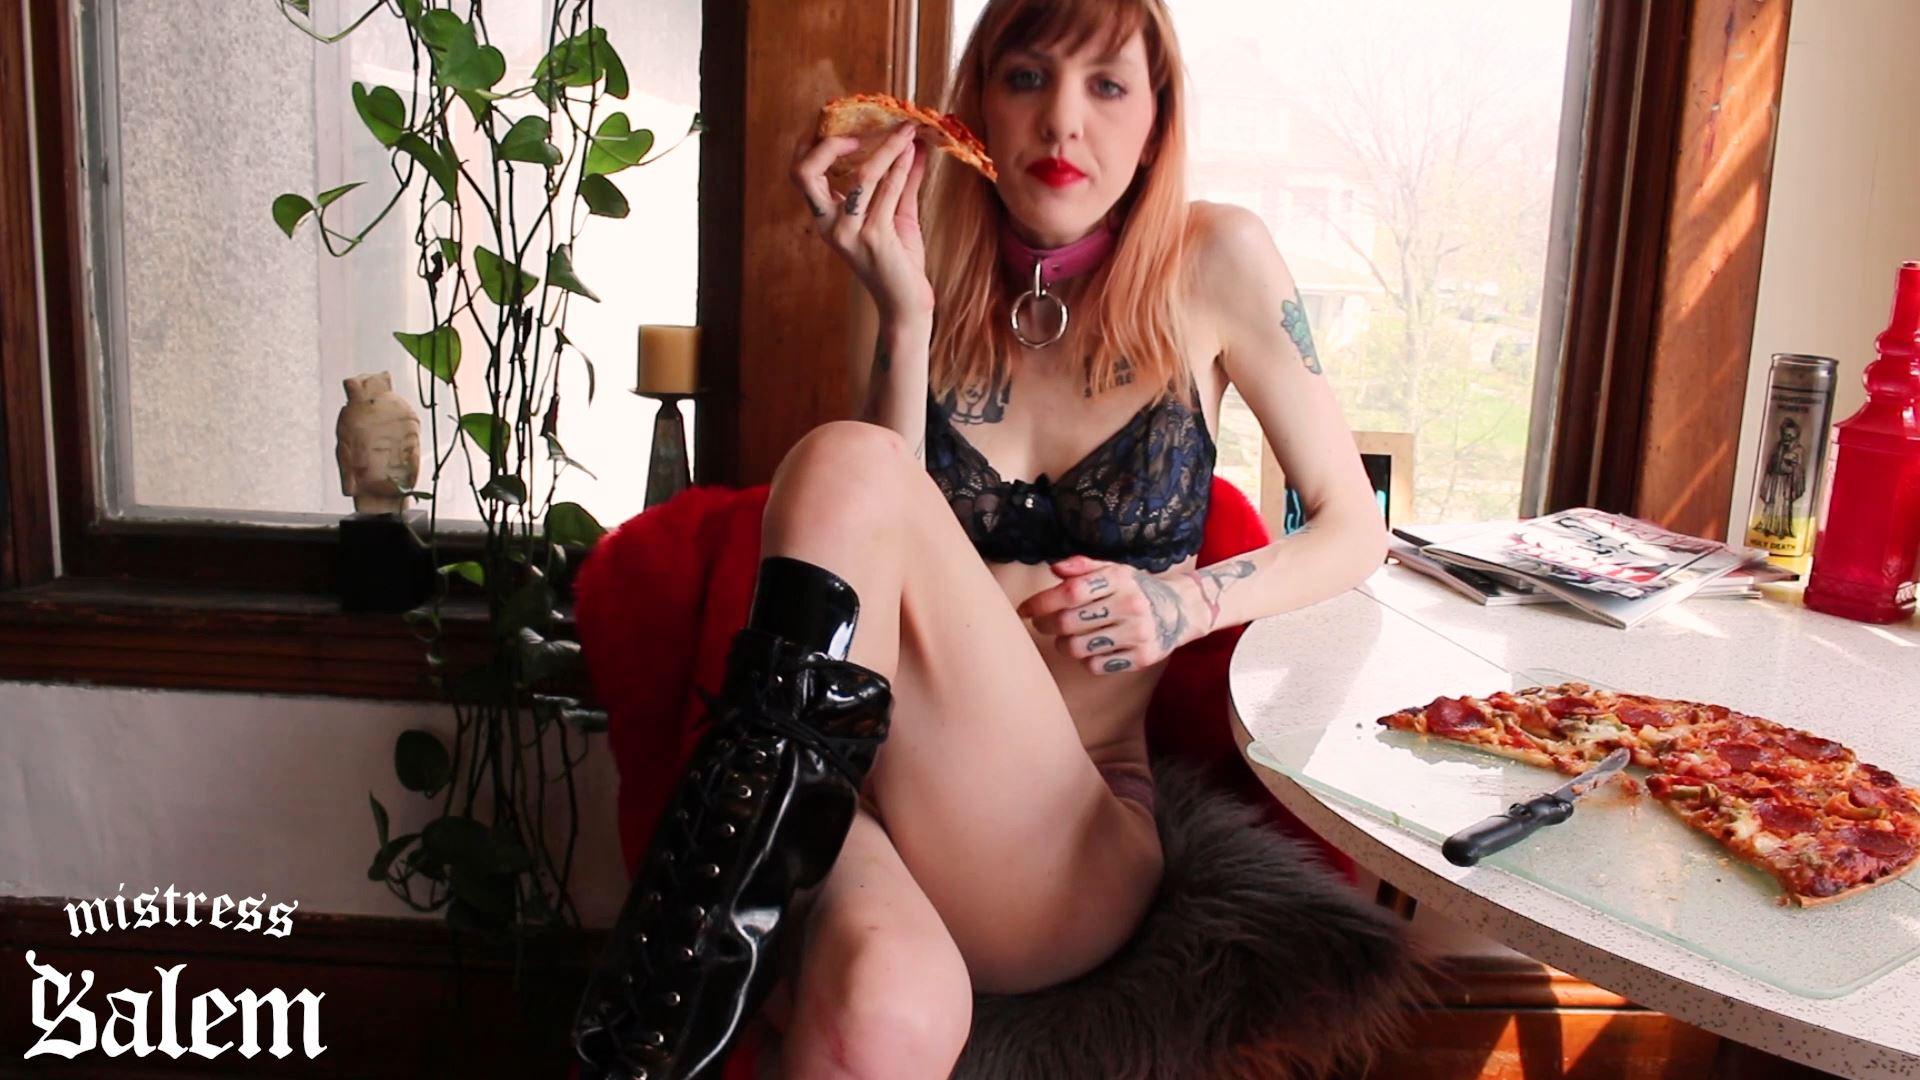 Mistress Salem In Scene: Loser Lunch Date Pizza Party Humiliation - MISTERSS SALEM - FULL HD/1080p/MP4